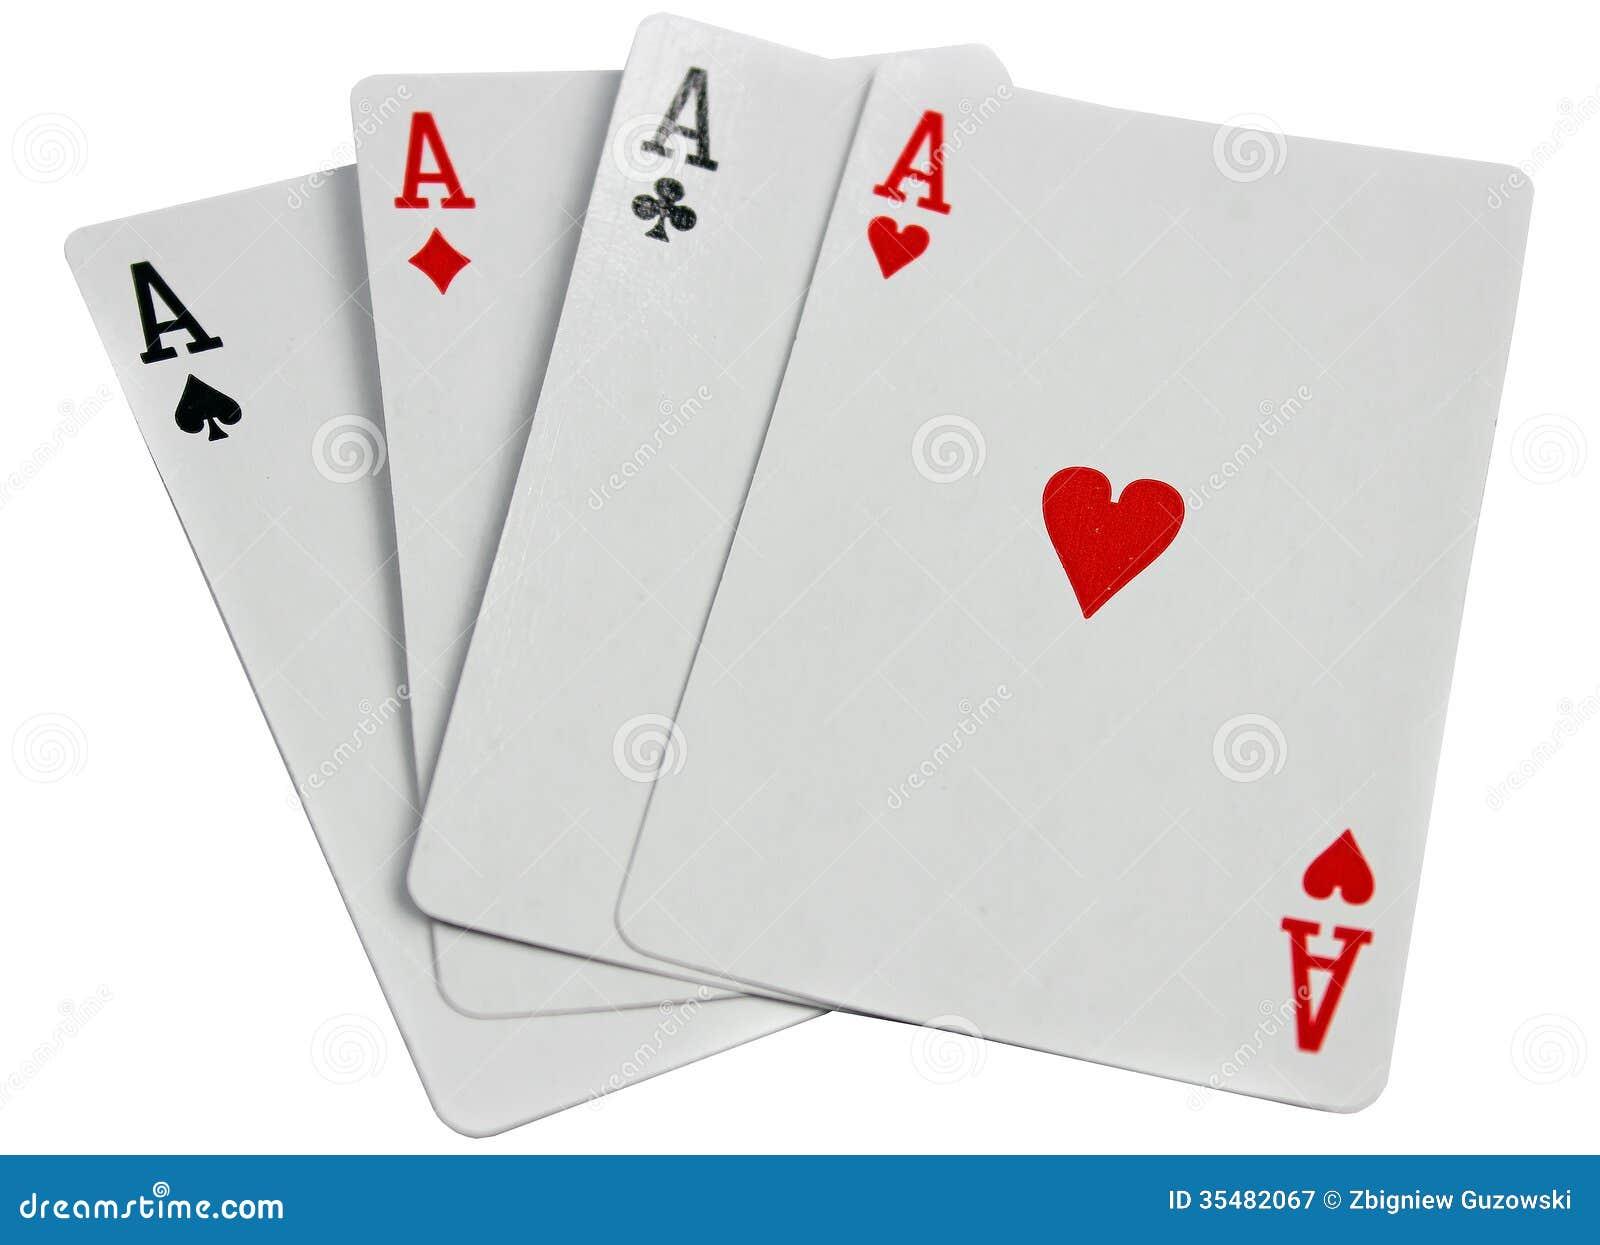 Csgo game betting sites